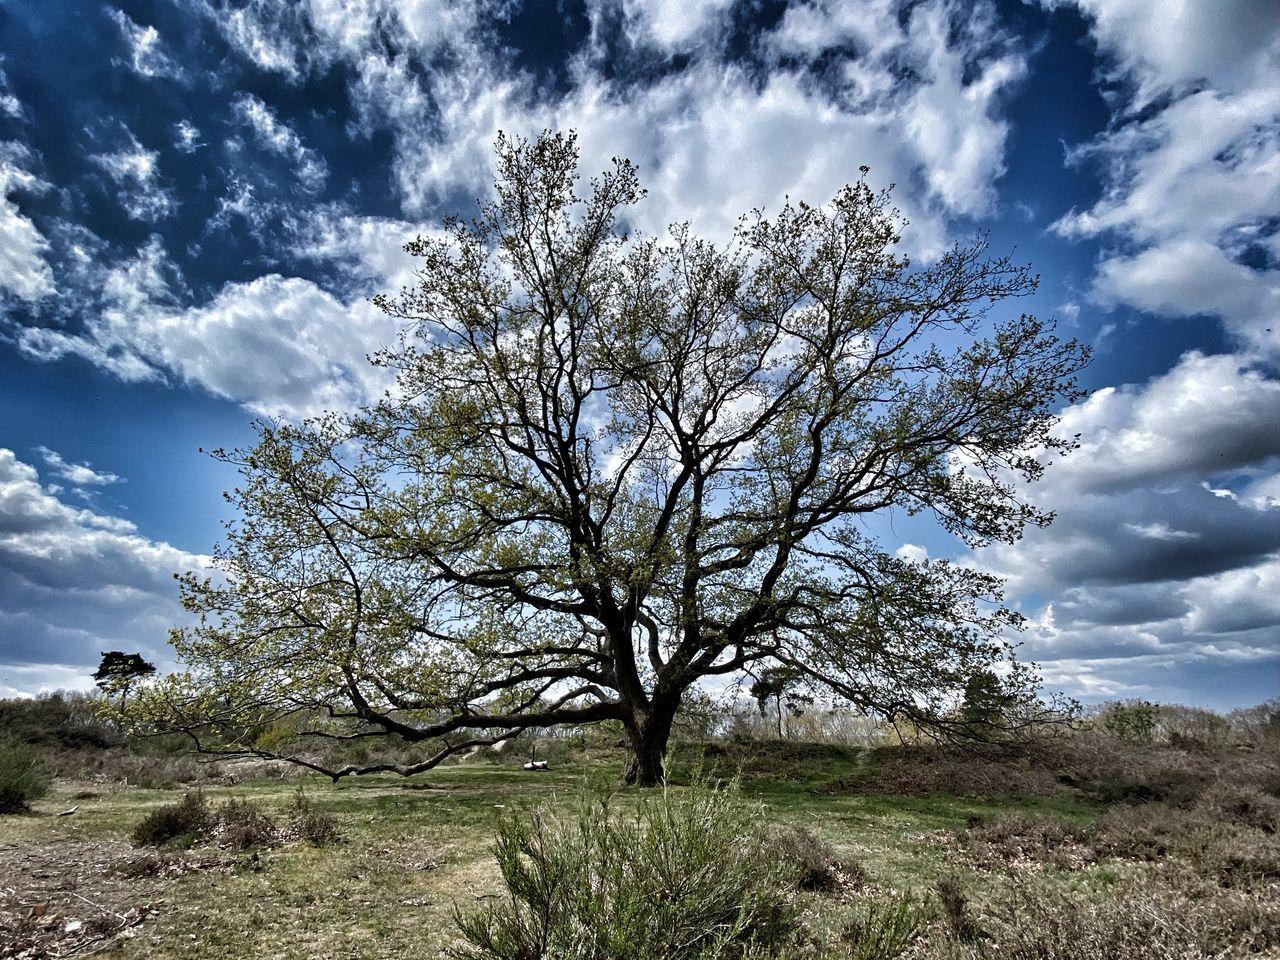 TREE IN FIELD AGAINST CLOUDY SKY